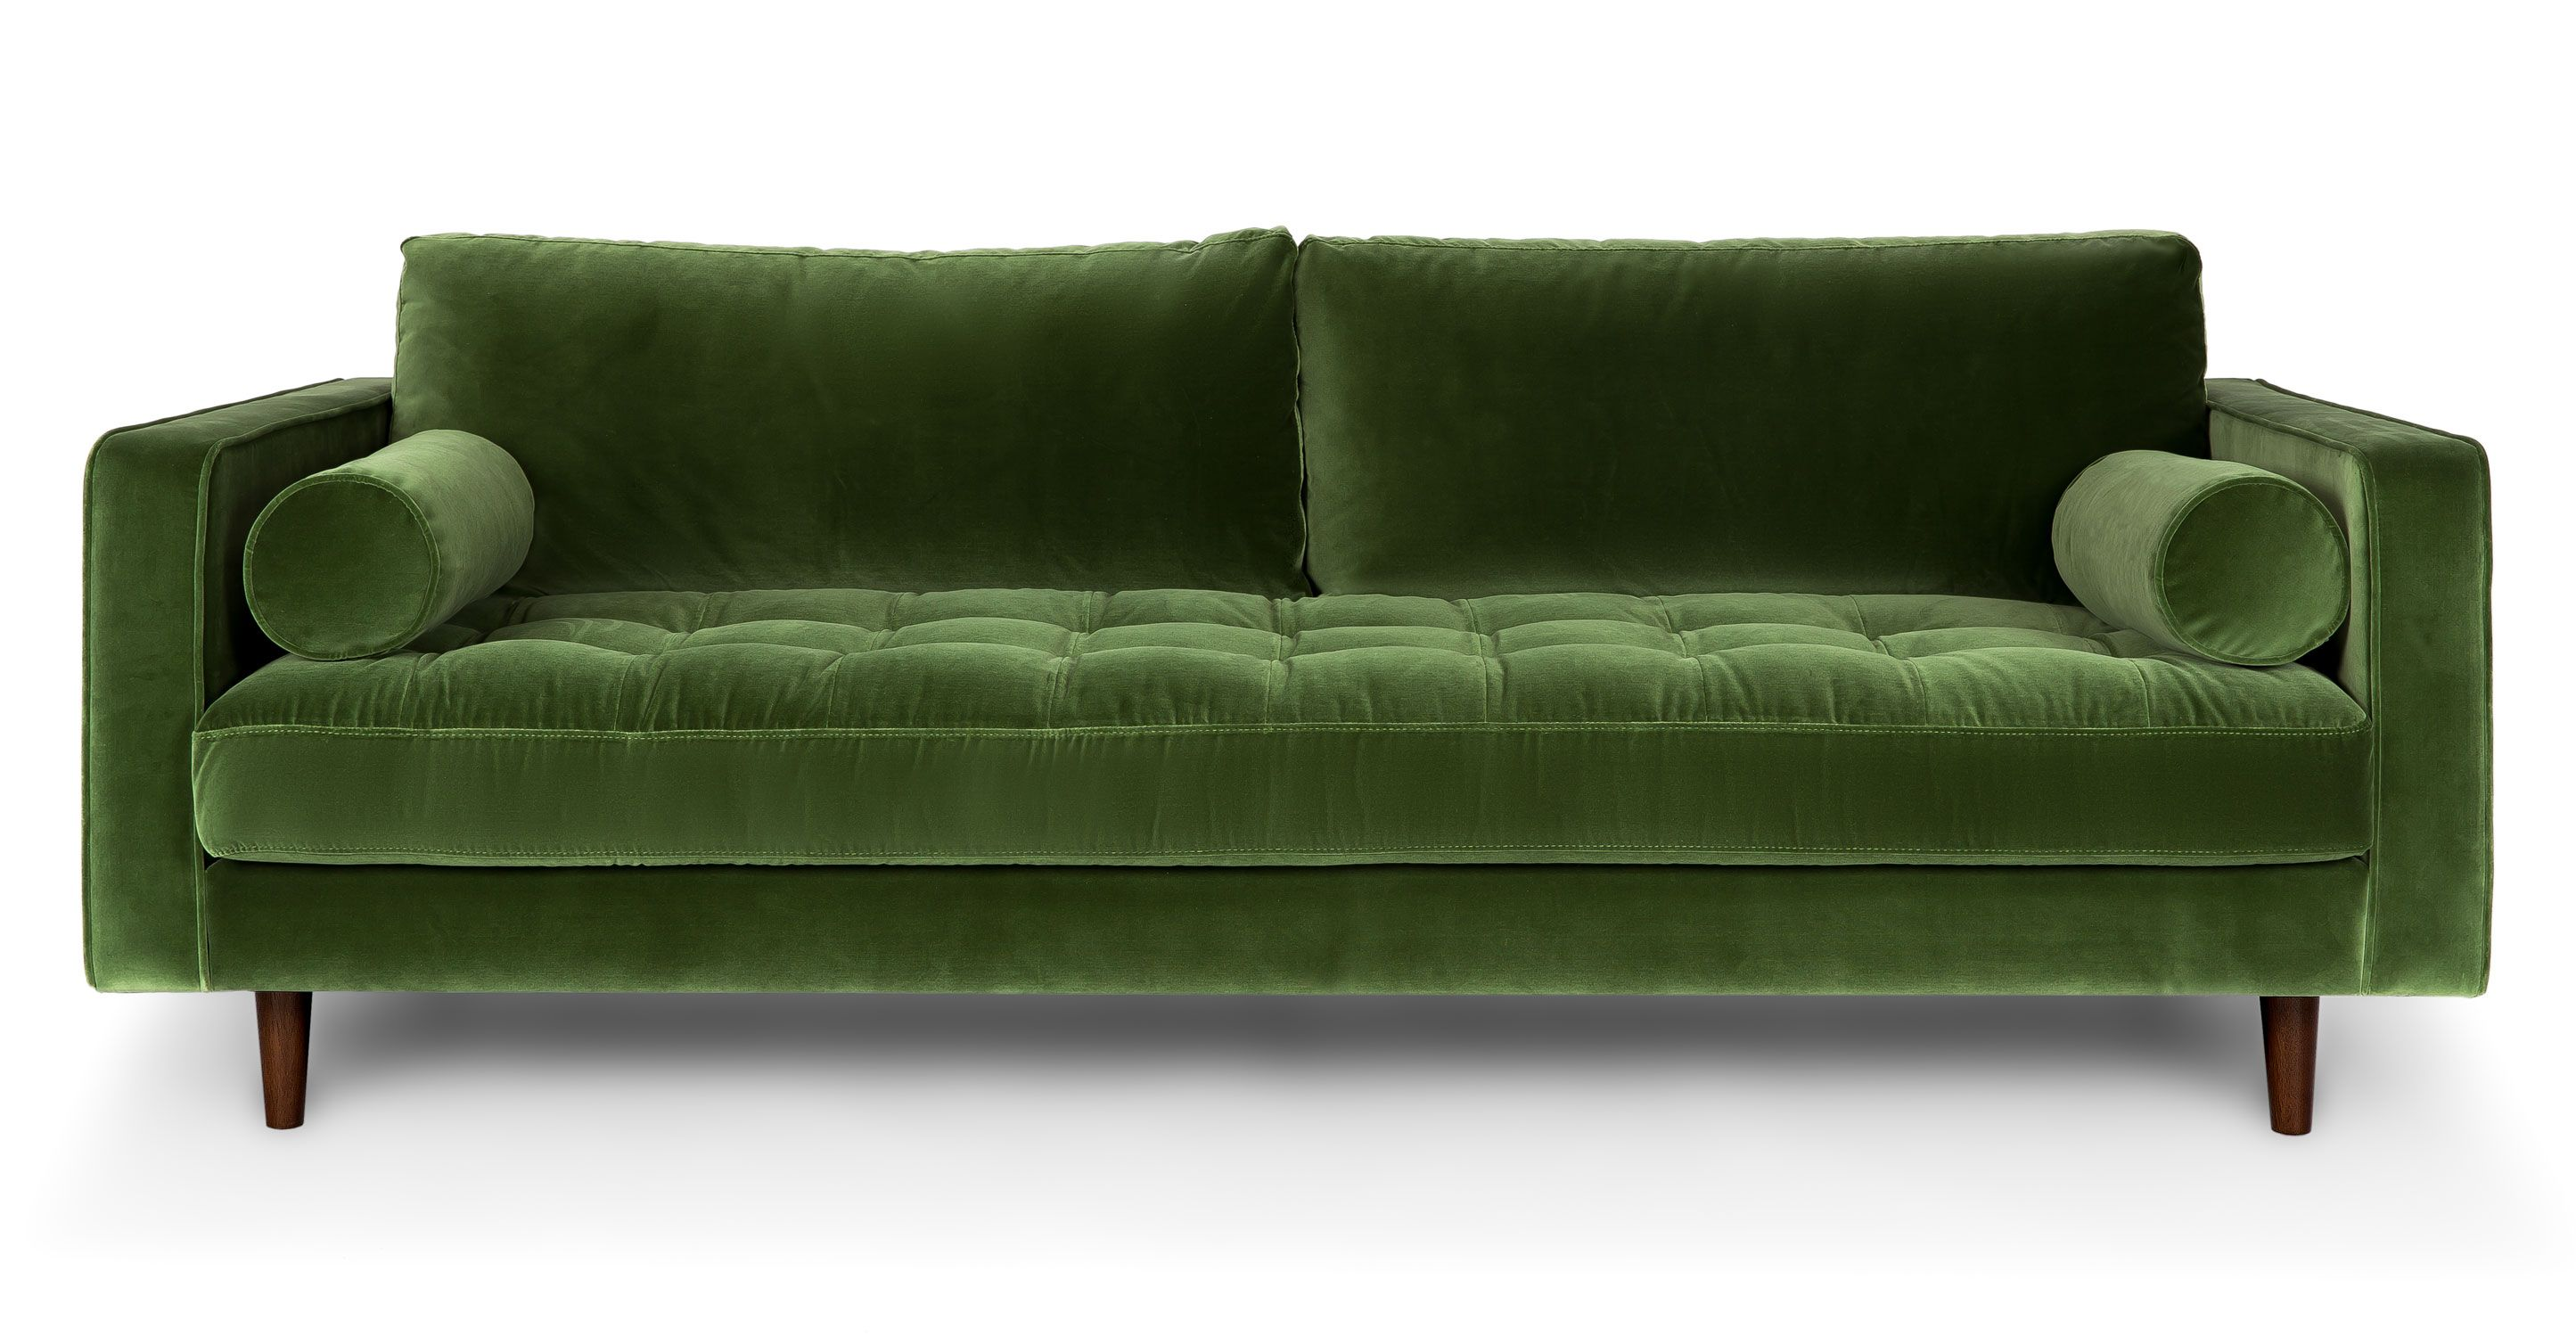 Sven Grass Green Sofa in 2019 | Furniture and Decor | Green sofa ...